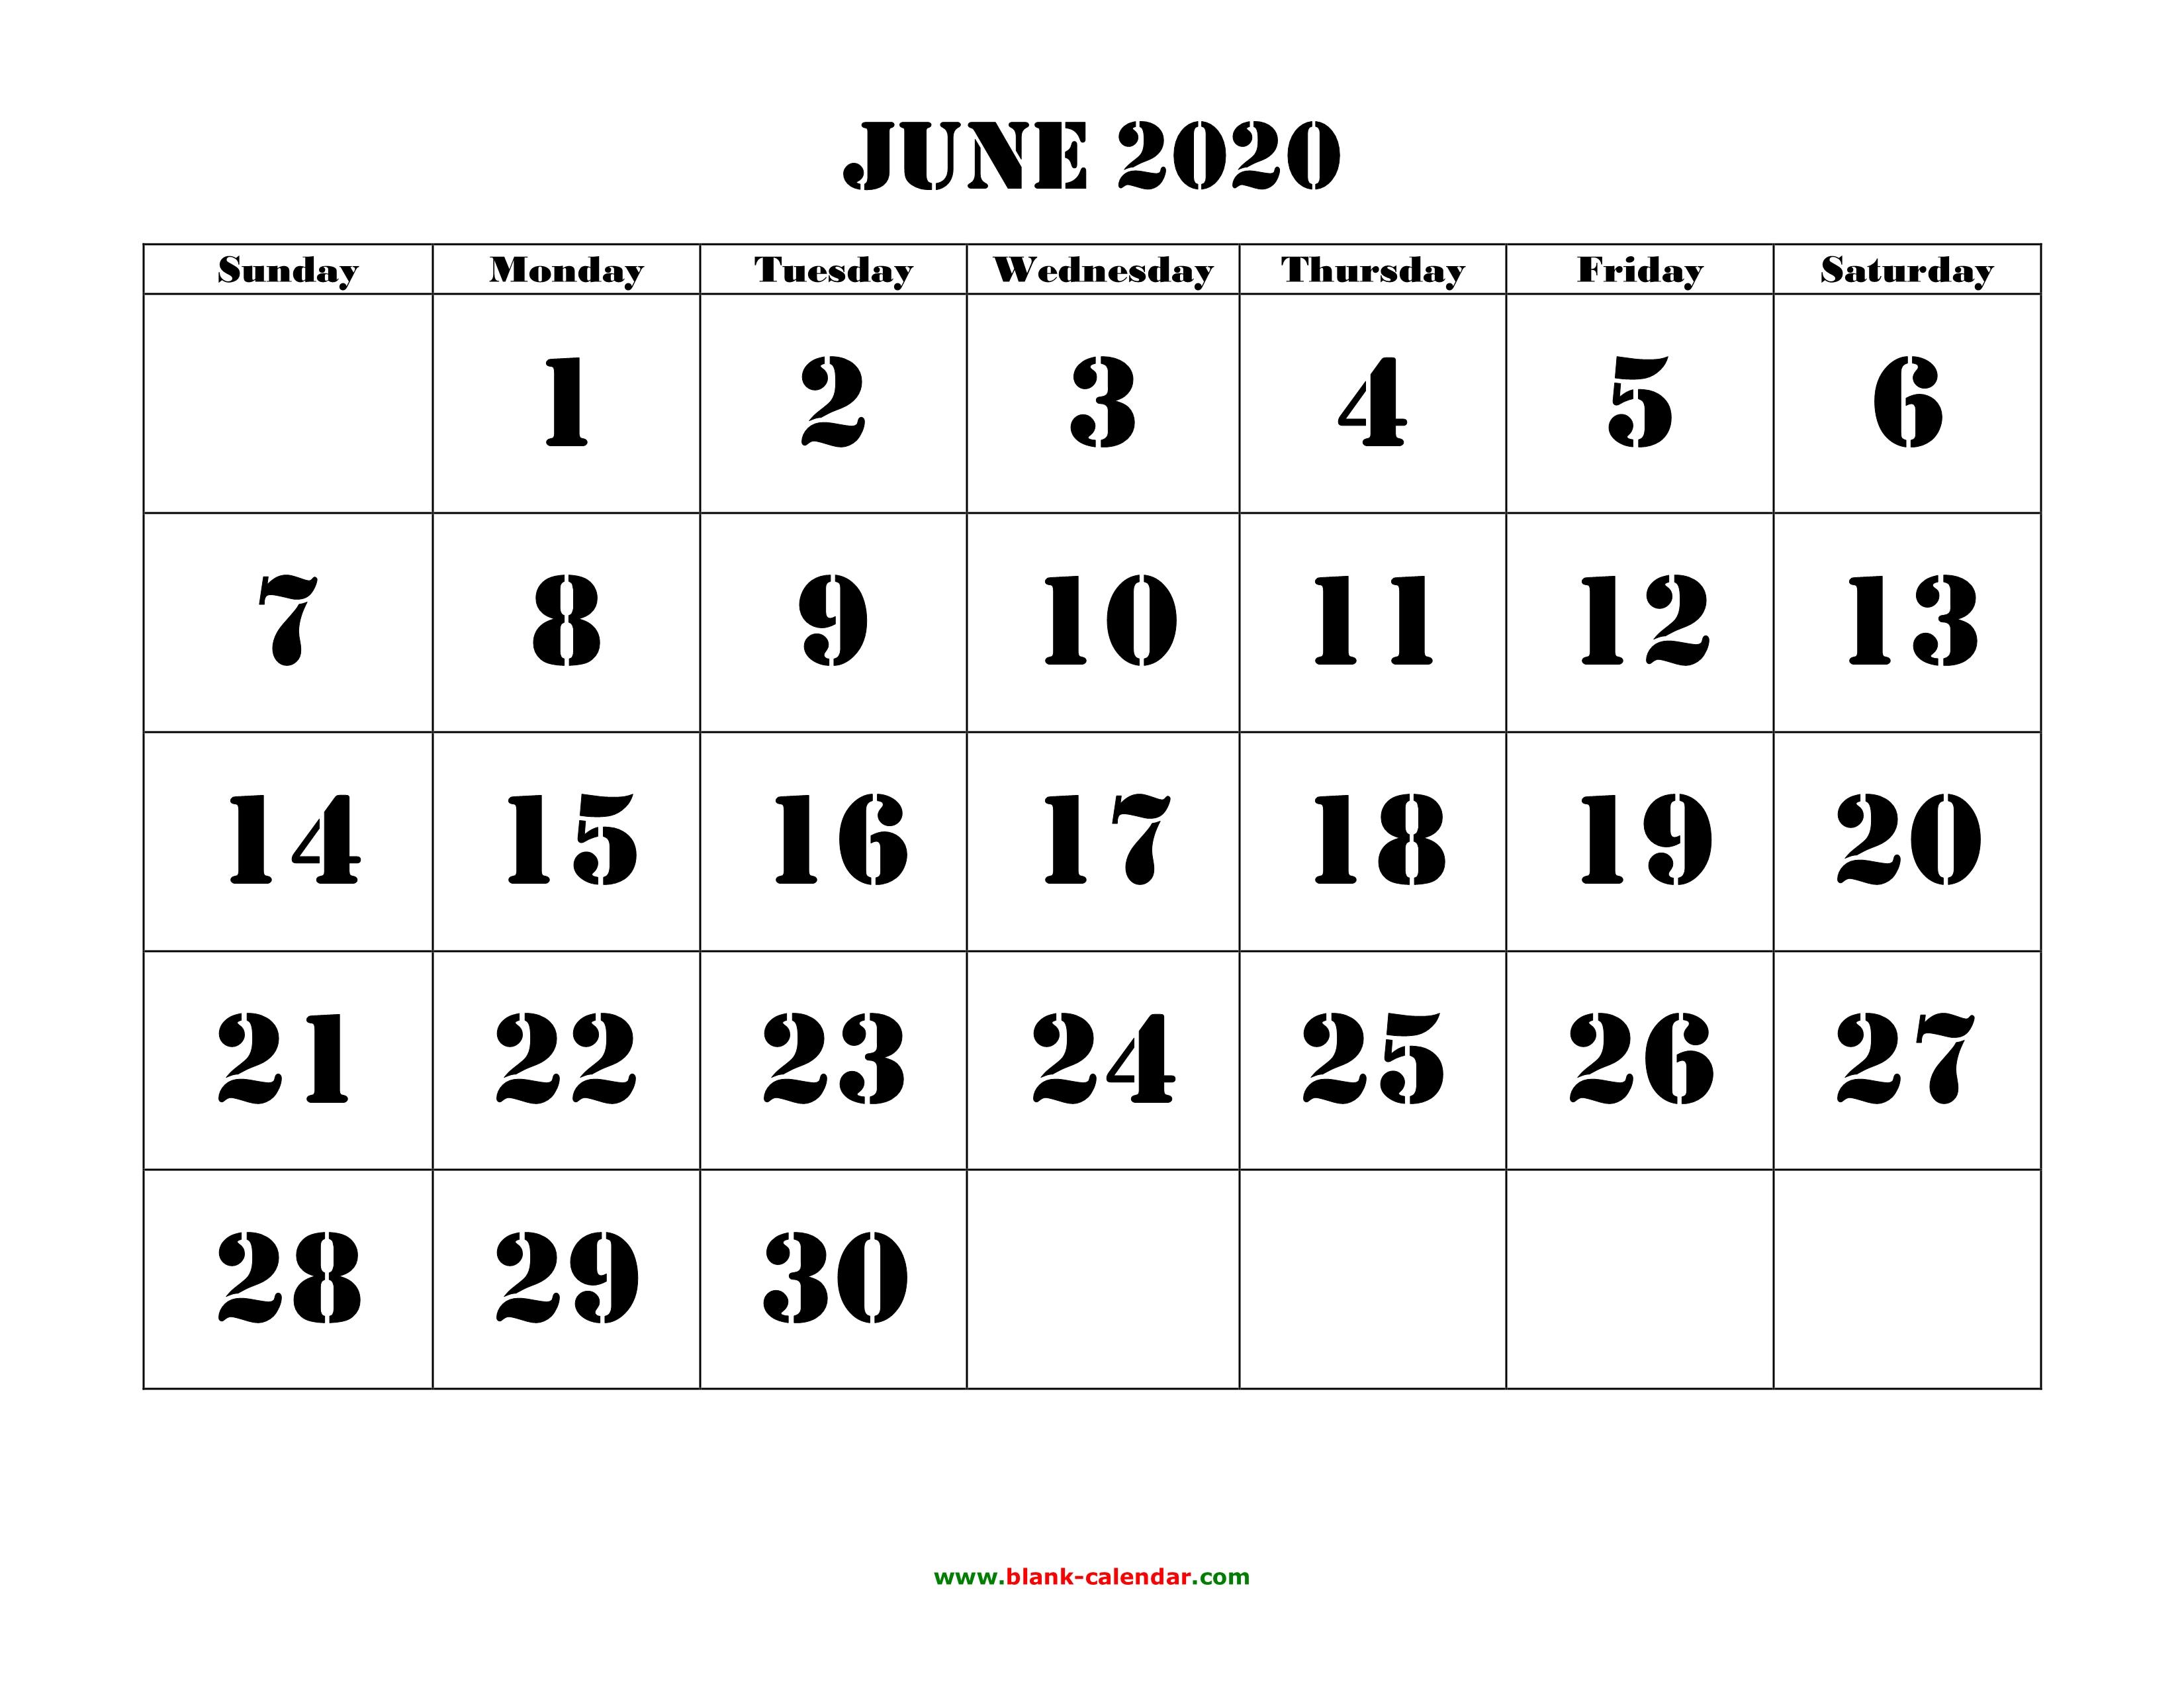 Free Download Printable June 2020 Calendar, Large Font